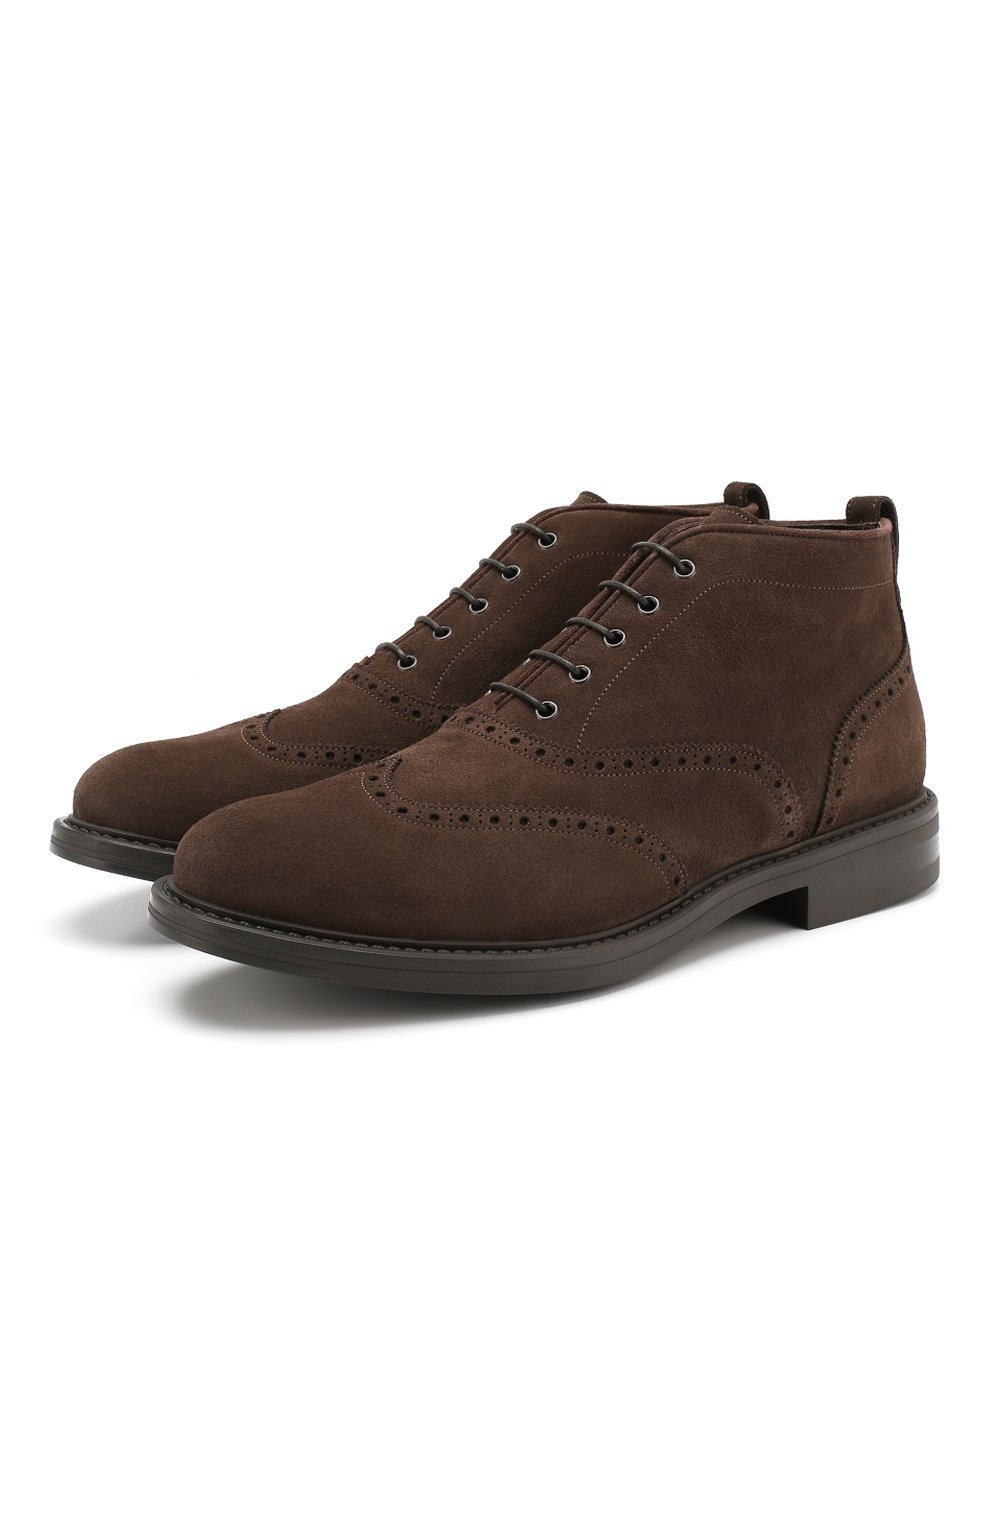 Мужские замшевые ботинки W.GIBBS темно-коричневого цвета, арт. 3169015/1521 | Фото 1